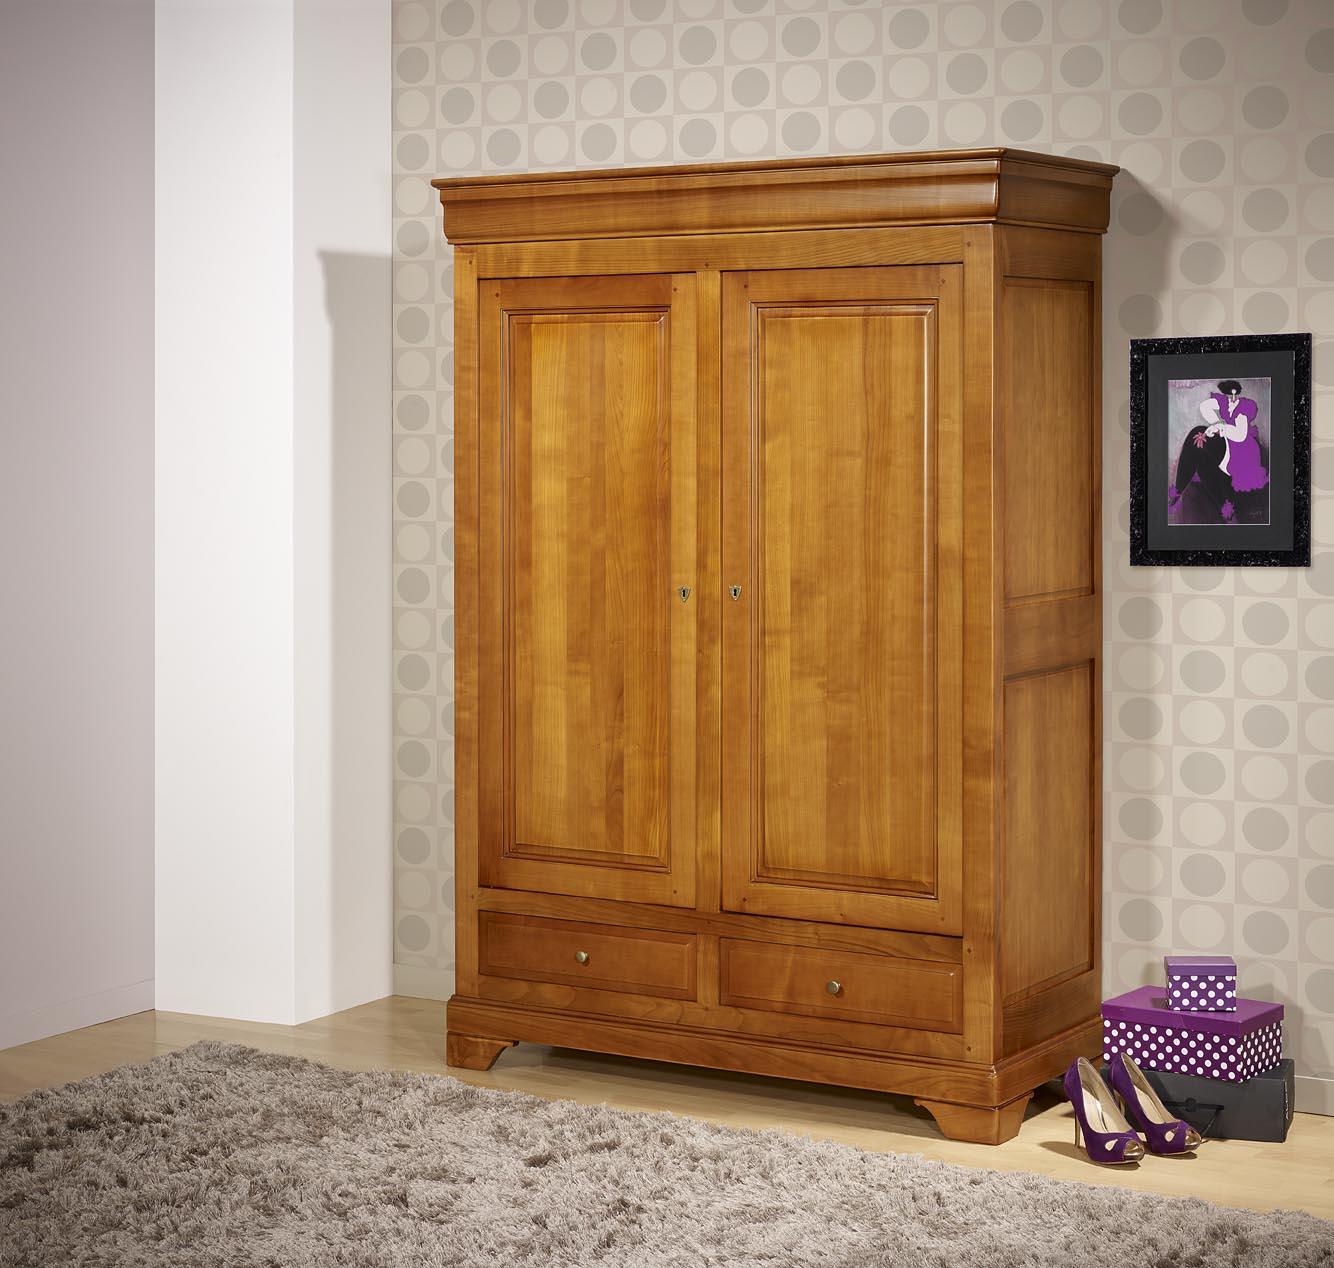 Petite armoire 2 portes 2 tiroirs in s en merisier massif - Armoire ancienne 2 portes ...